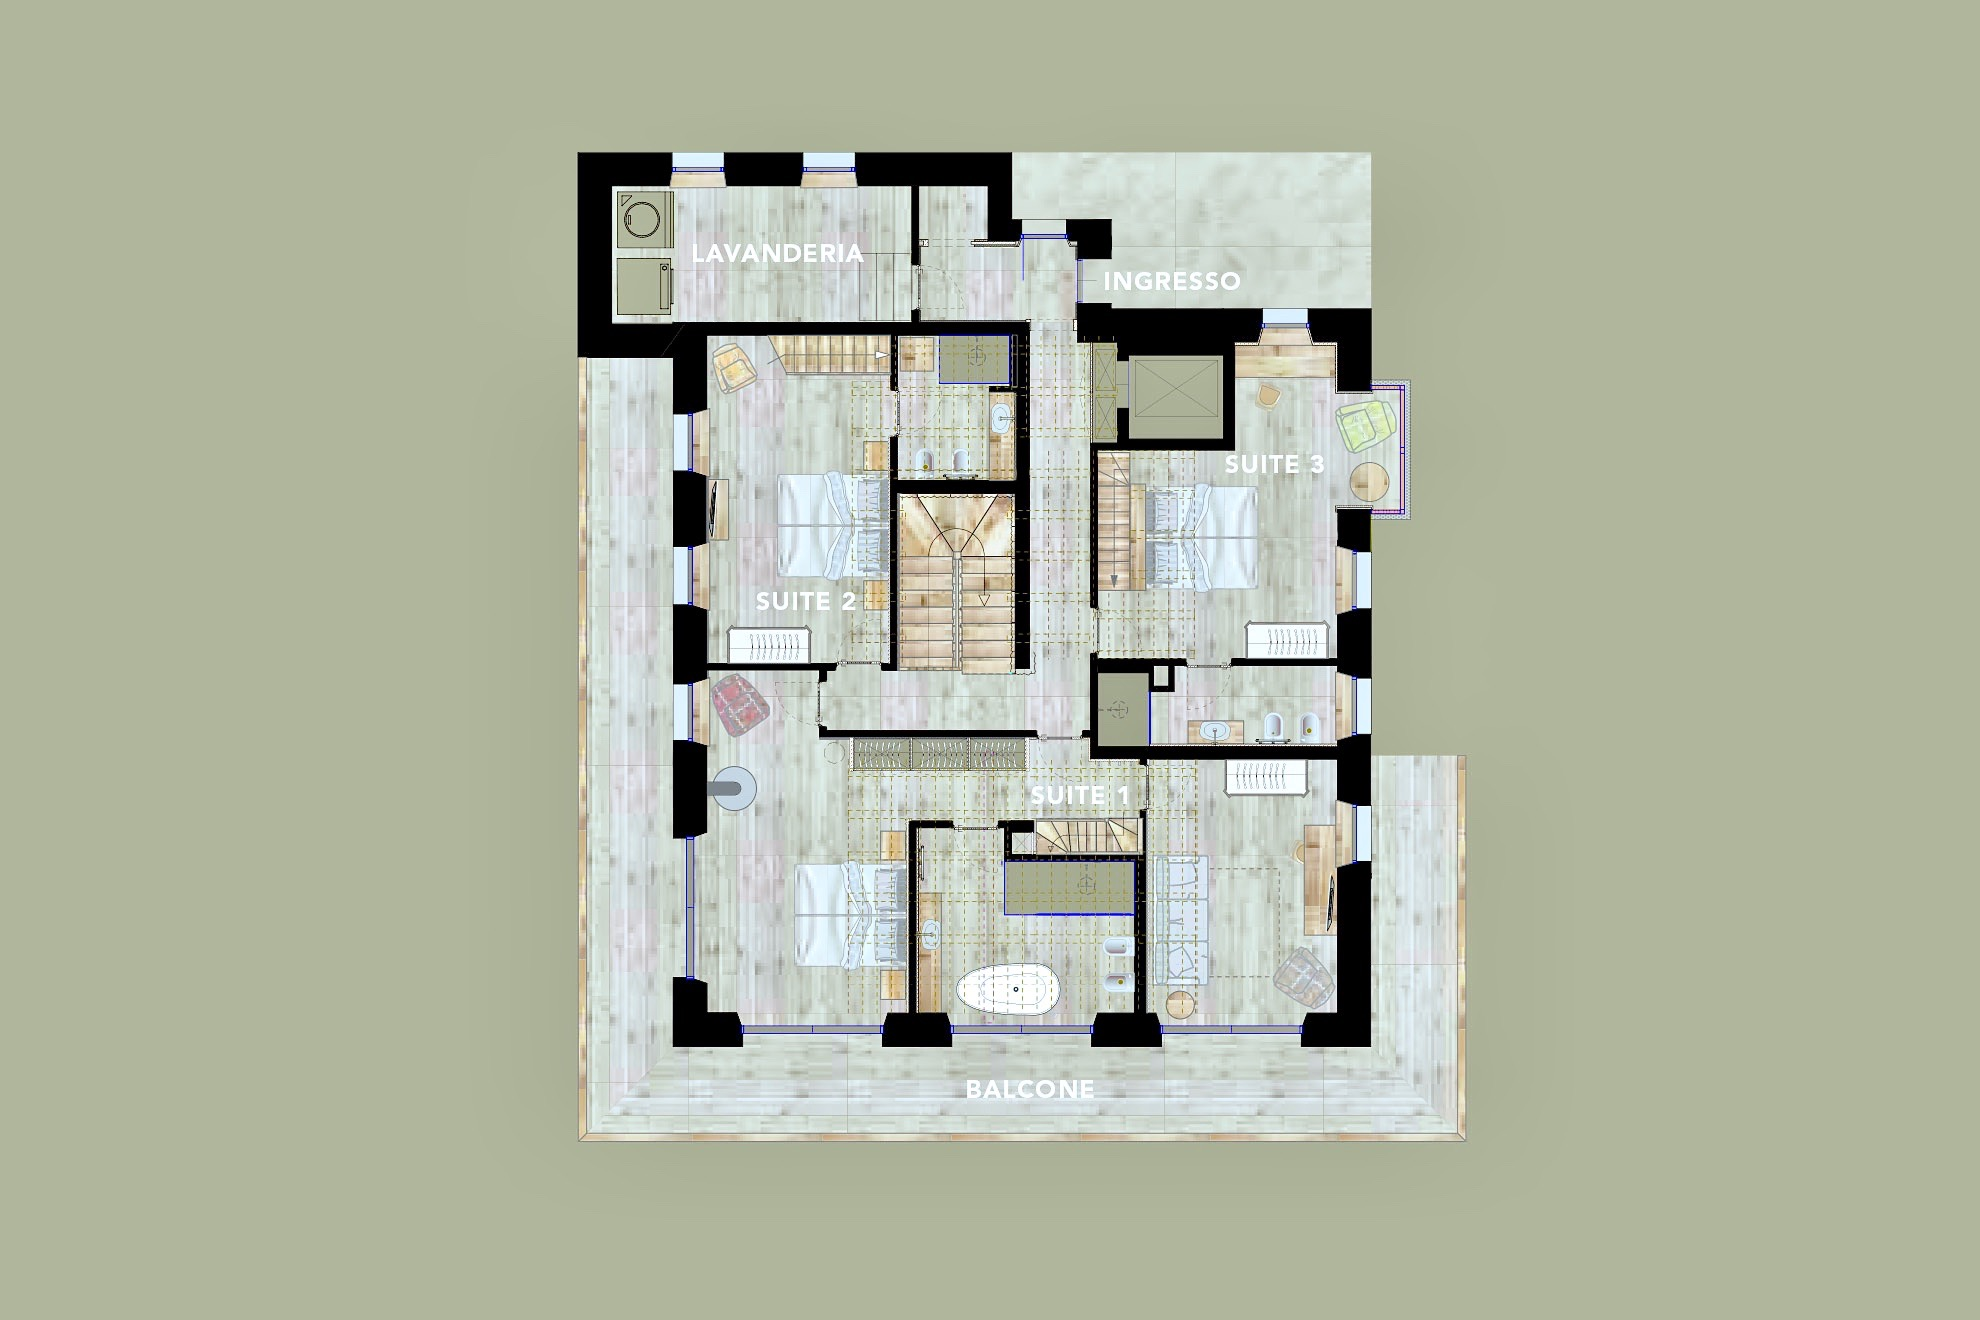 Mappa02